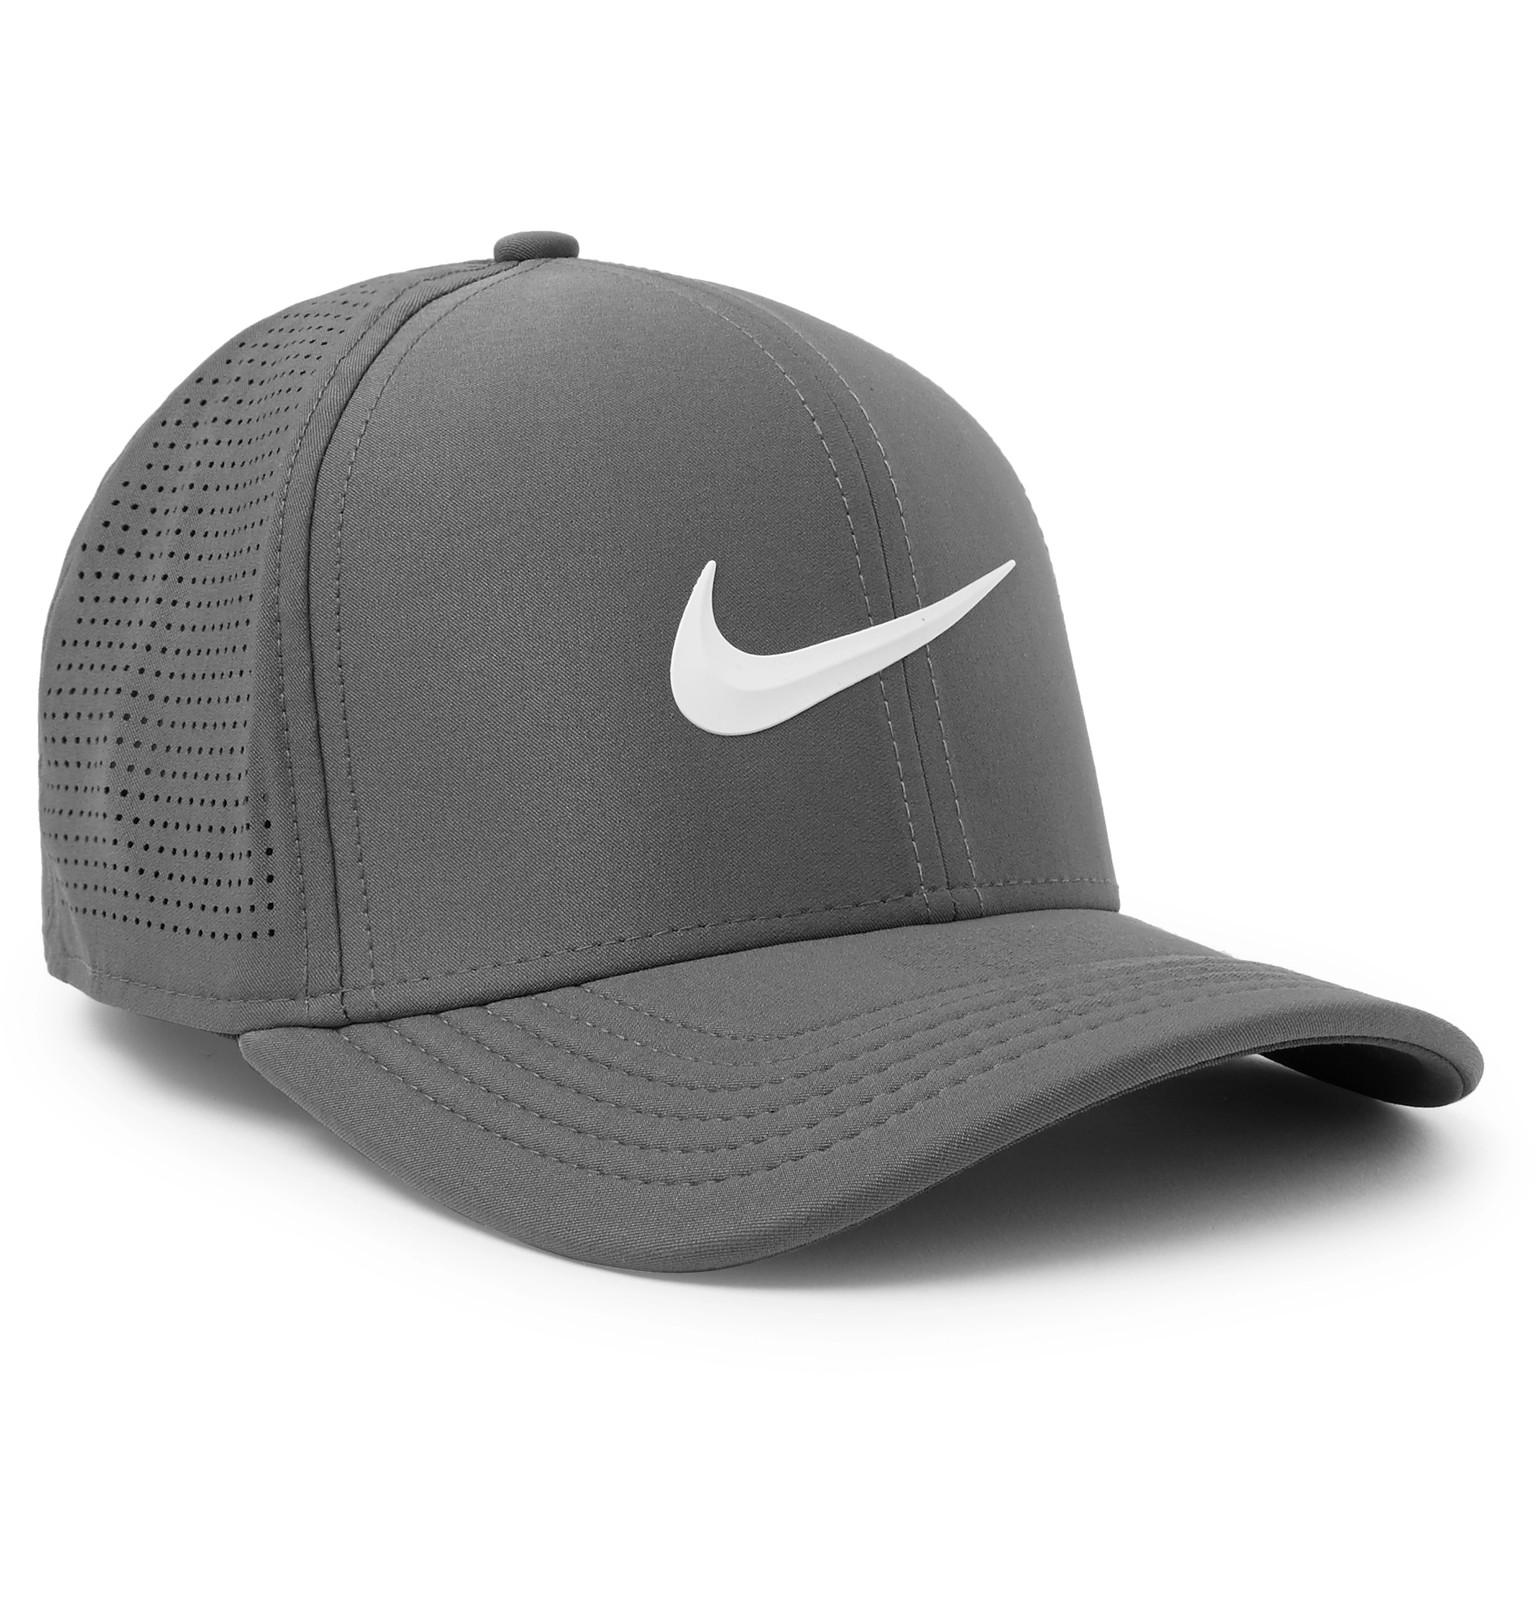 b7de62fcd3e Nike Aerobill Classic 99 Perforated Dri-fit Cap in Gray for Men - Lyst